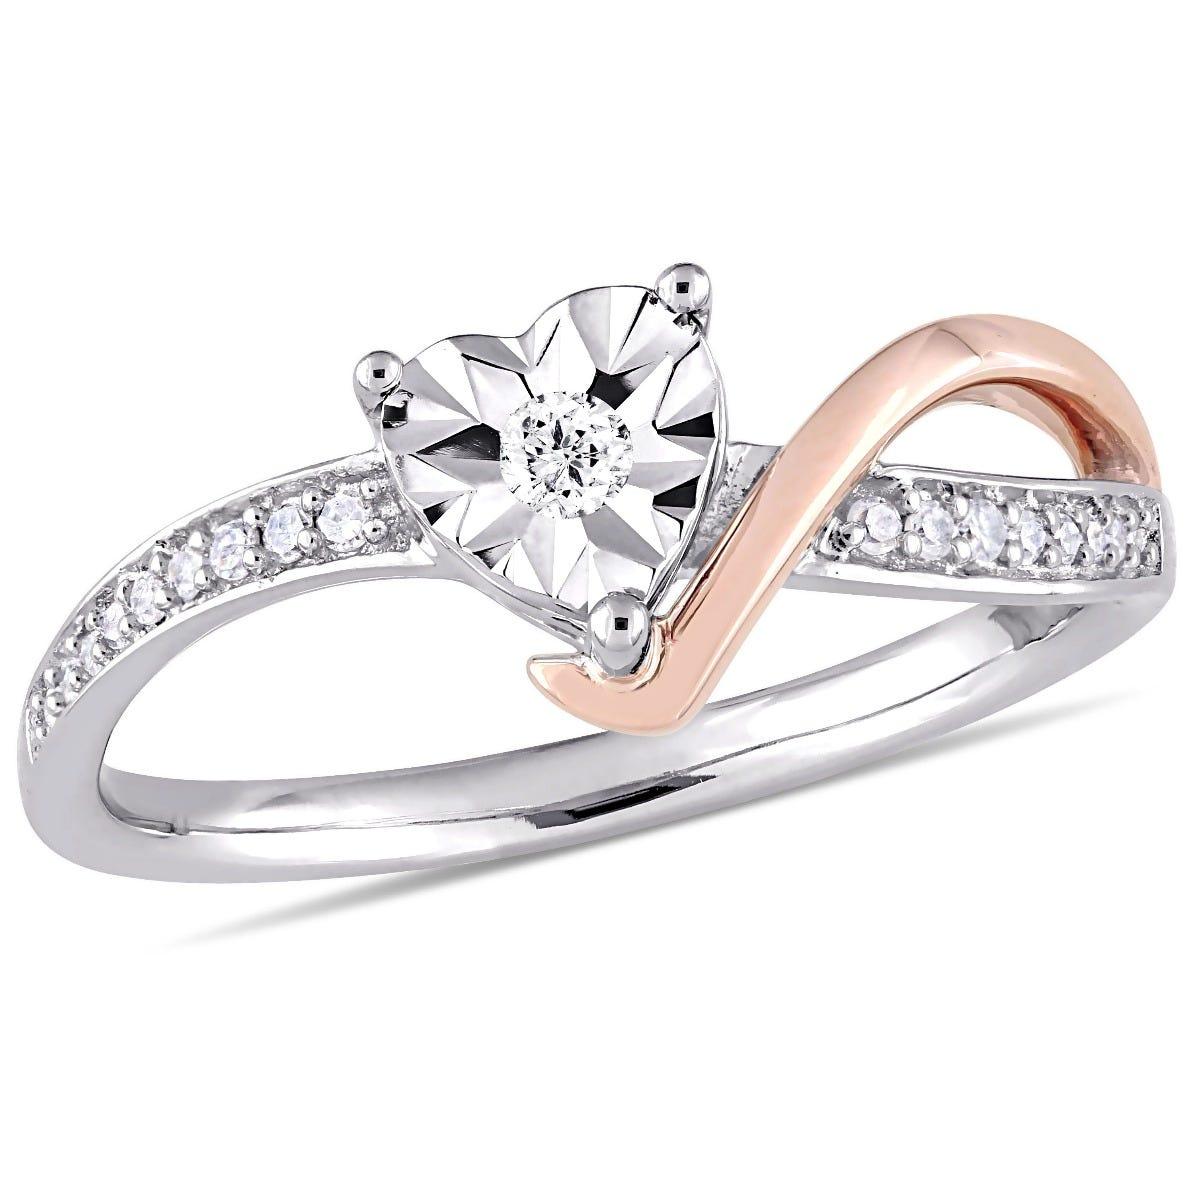 Heart-Shaped Diamond Twist Promise Ring 1/10ctw. in 10k White & Rose Gold